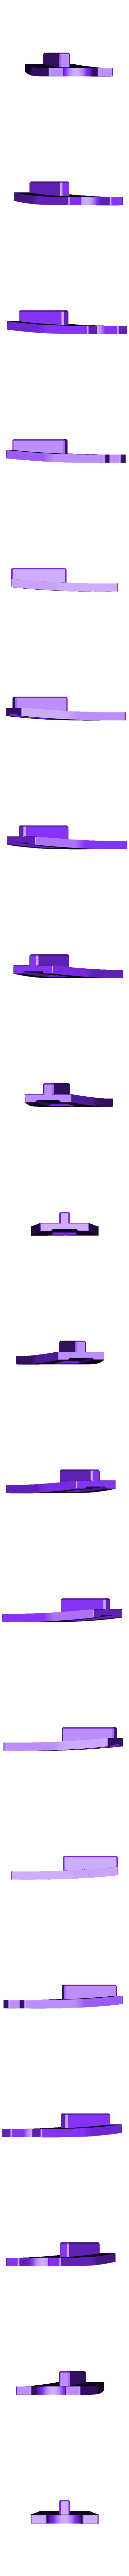 35_Drag_Waist8_Belt3_YELLOW.stl Download STL file ARTICULATED DRAGONLORD (not Dragonzord) - NO SUPPORT • 3D printer model, Toymakr3D